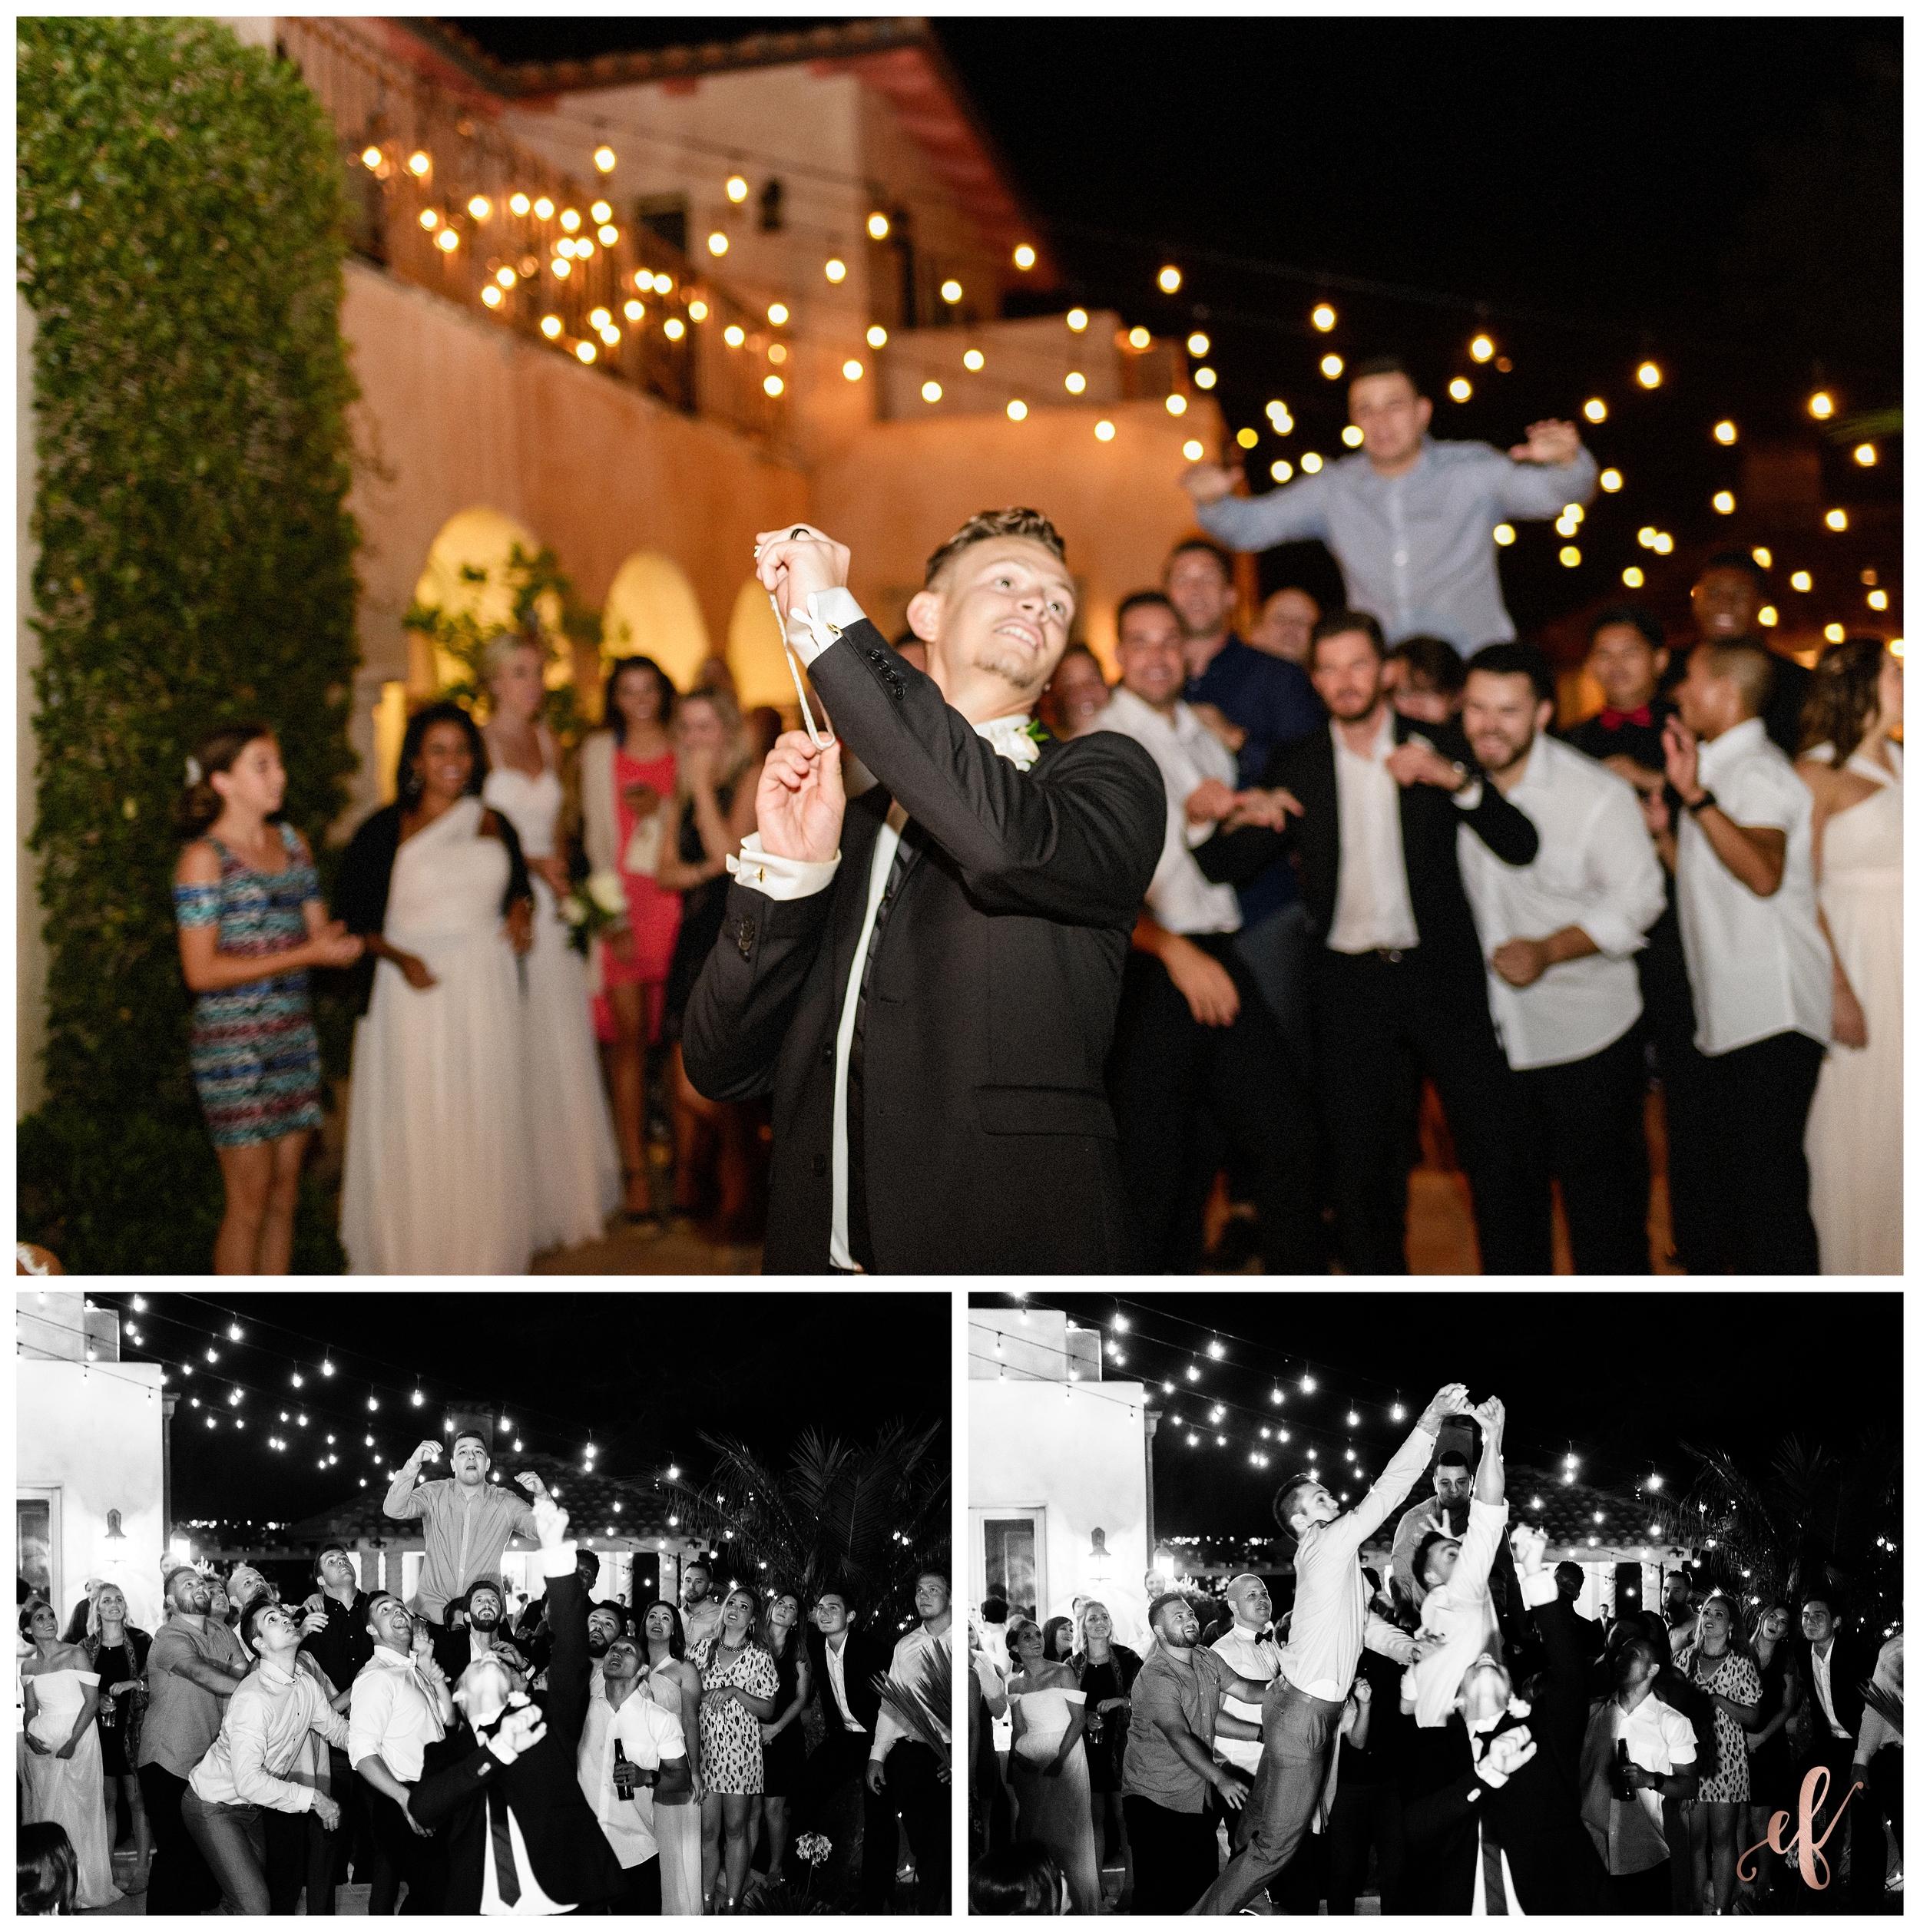 San Diego Wedding Photographer   Ernie & Fiona Photography   Garter Toss   Bride   Groom